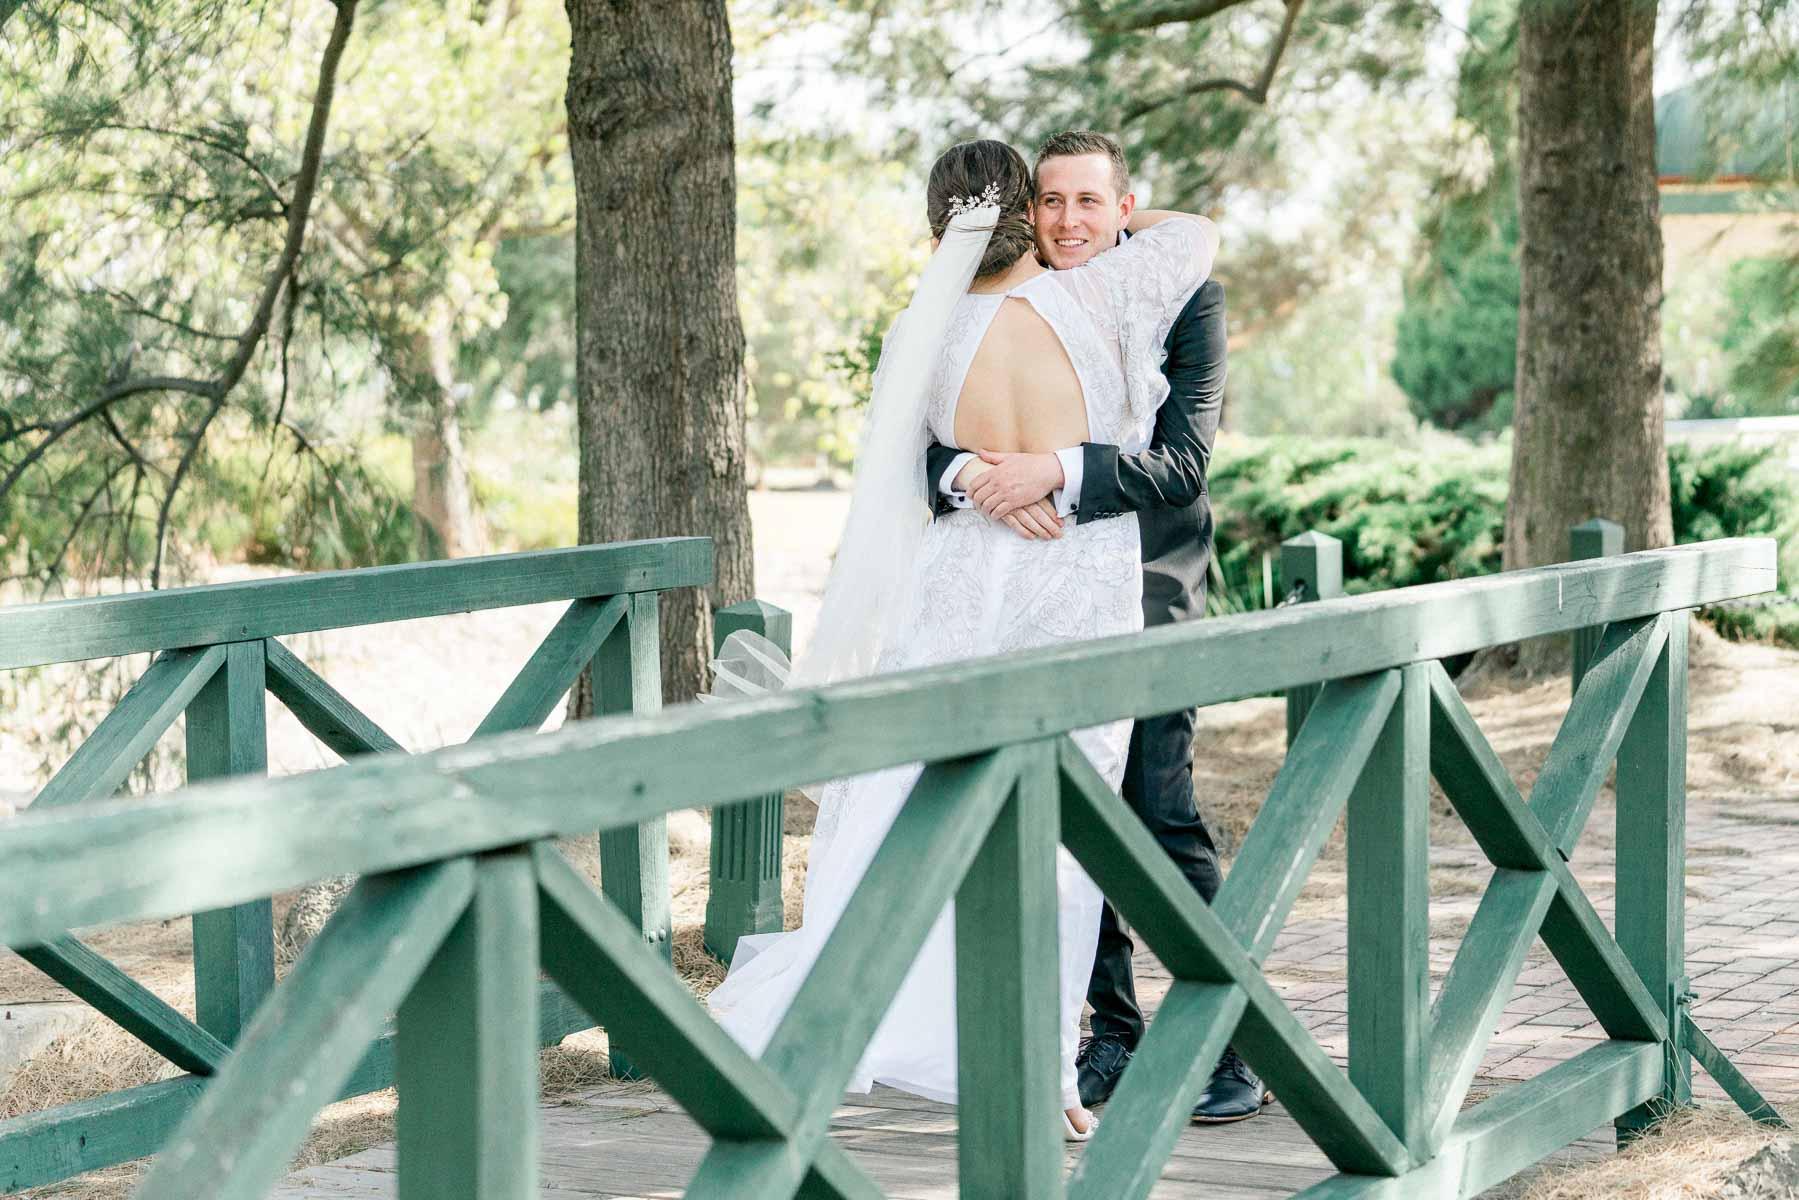 little-henri-cafe-wedding-thornbury-heart+soul-weddings-jane-aaron-05146.jpg